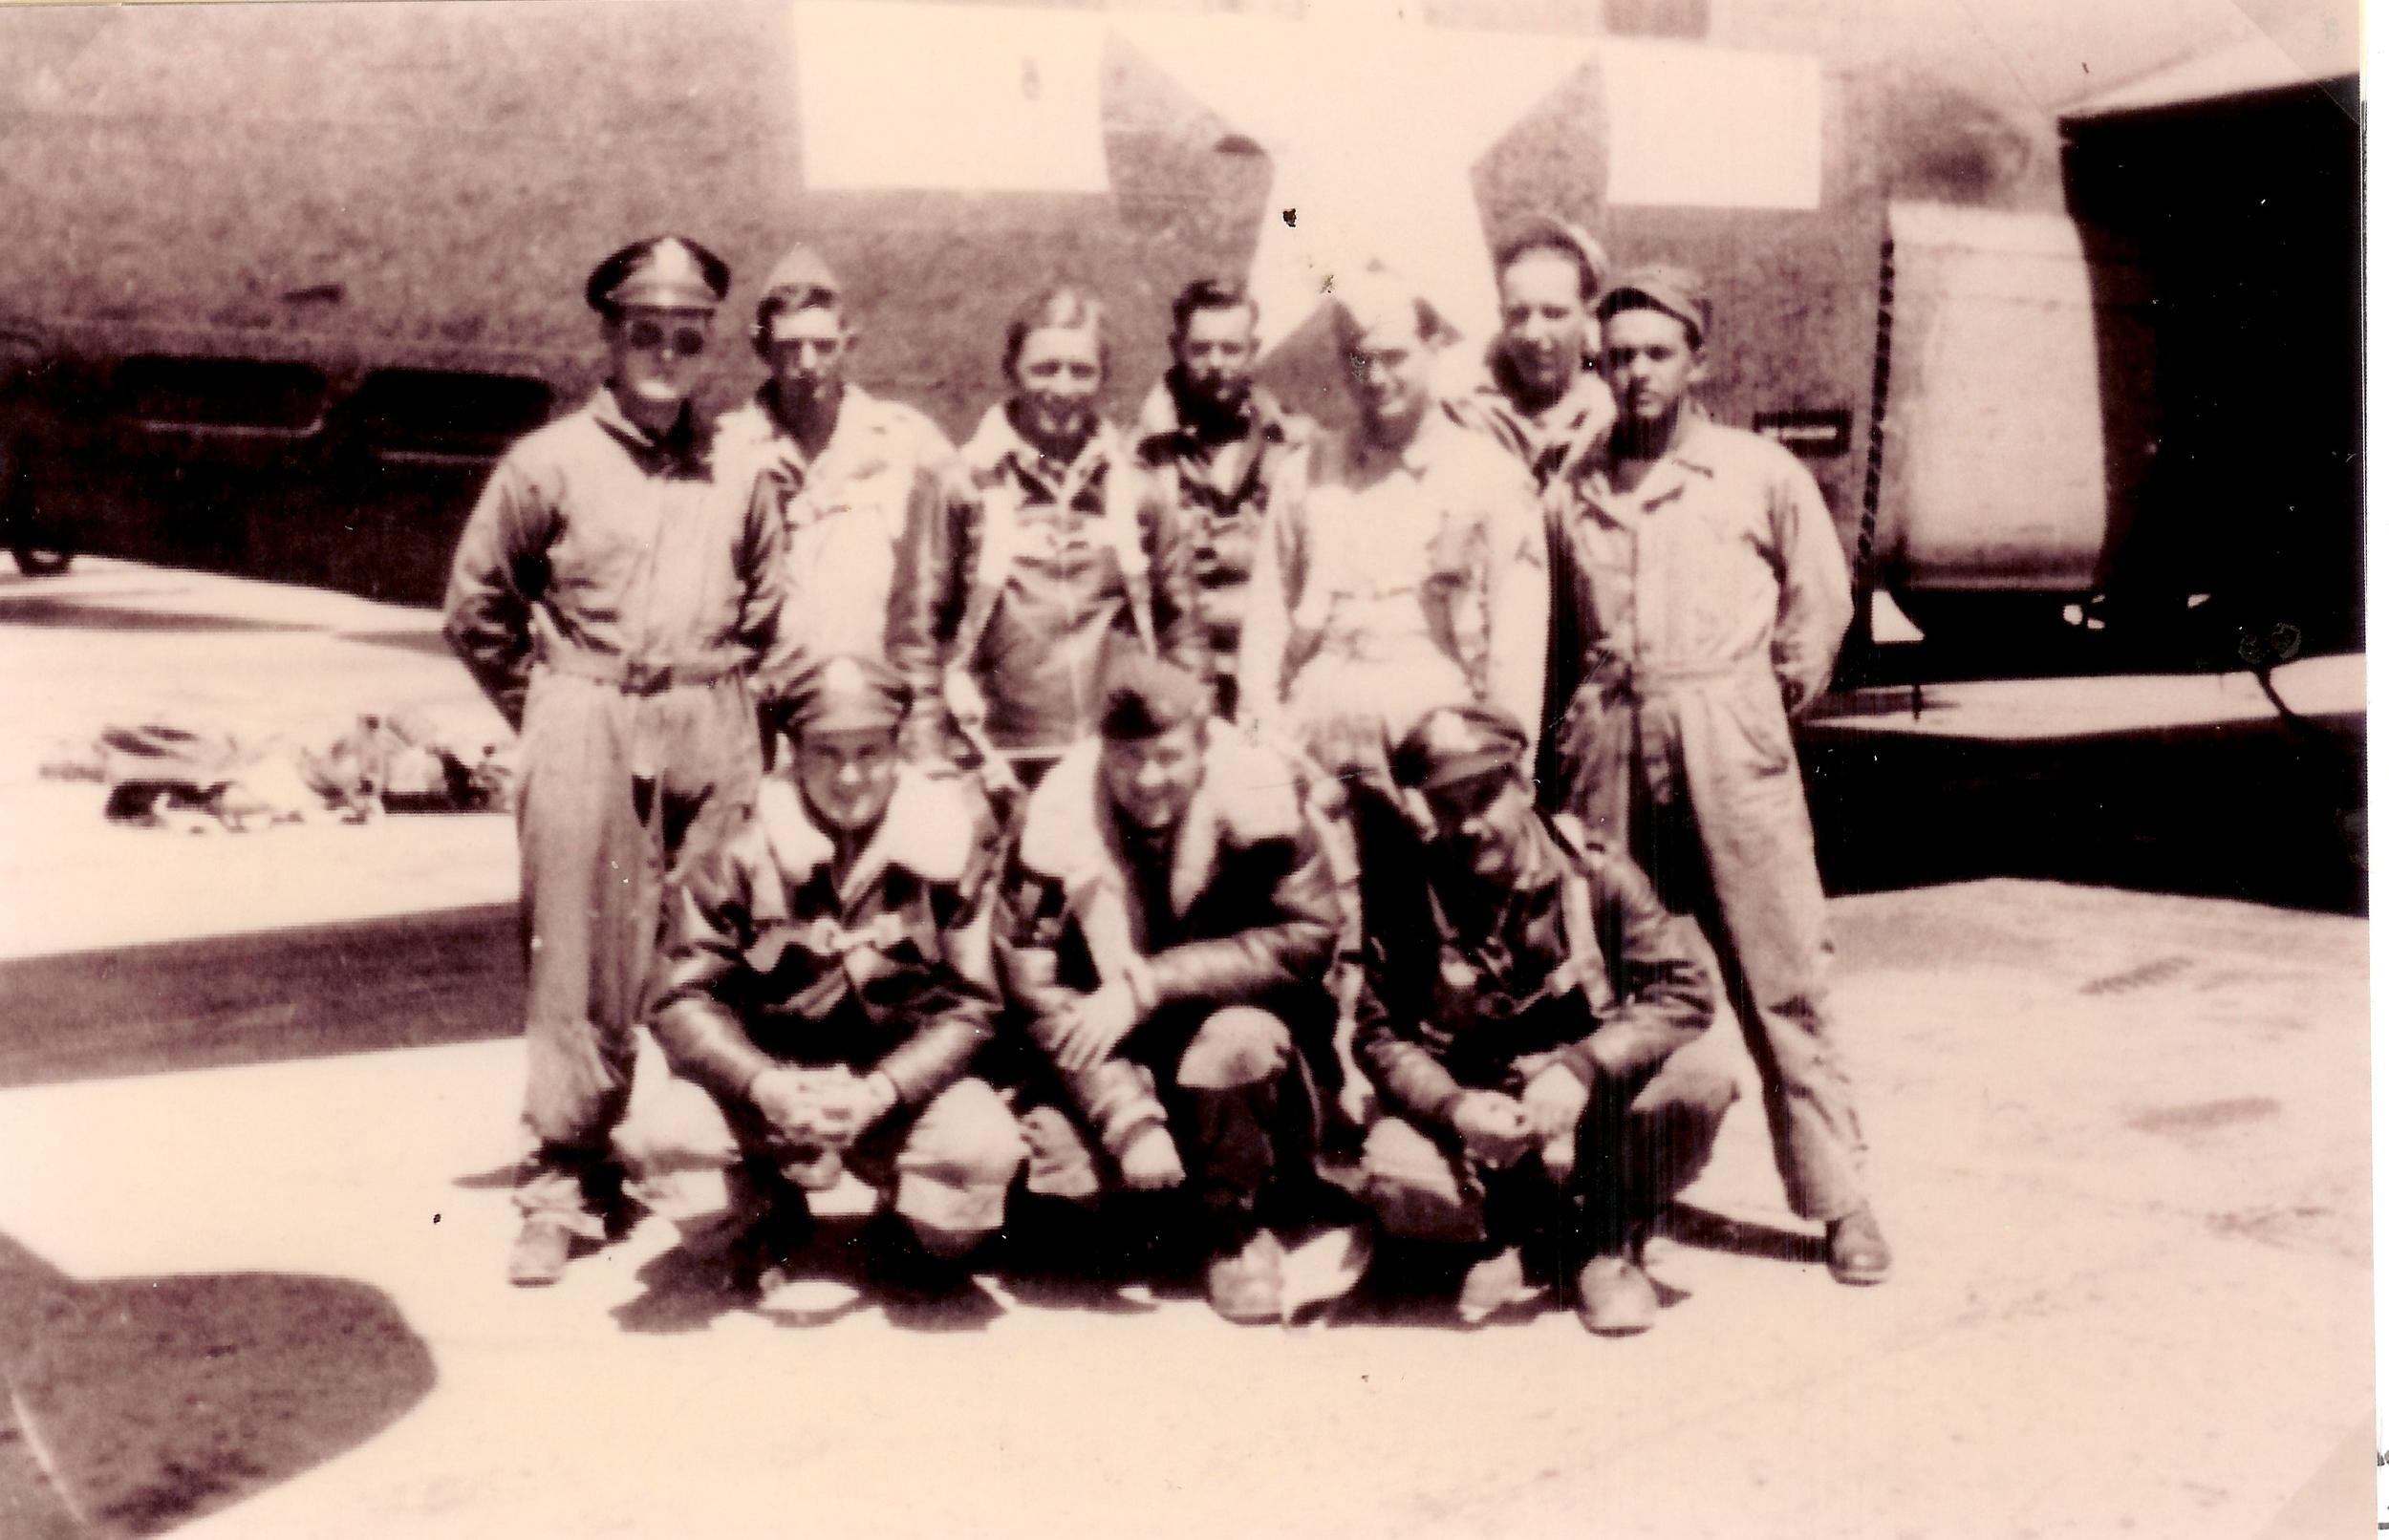 Back row, left to right: Edward Hautman--Pilot; Thomas Land--Top turret gunner; Stidman--Not a member of the crew in Germany; Orvel Howe--Waist Gunner; John Tarbert--Waist gunner; Dale Maupin--Nose gunner; Gordon Waldron--Tail gunner. Front row, left to right: Carroll Snidow--Co-pilot; Maynard Jones--Navigator; John Friese--Bombardier. Not shown: Harold Giesler--Radio operator who appears to have replaced Stidman.